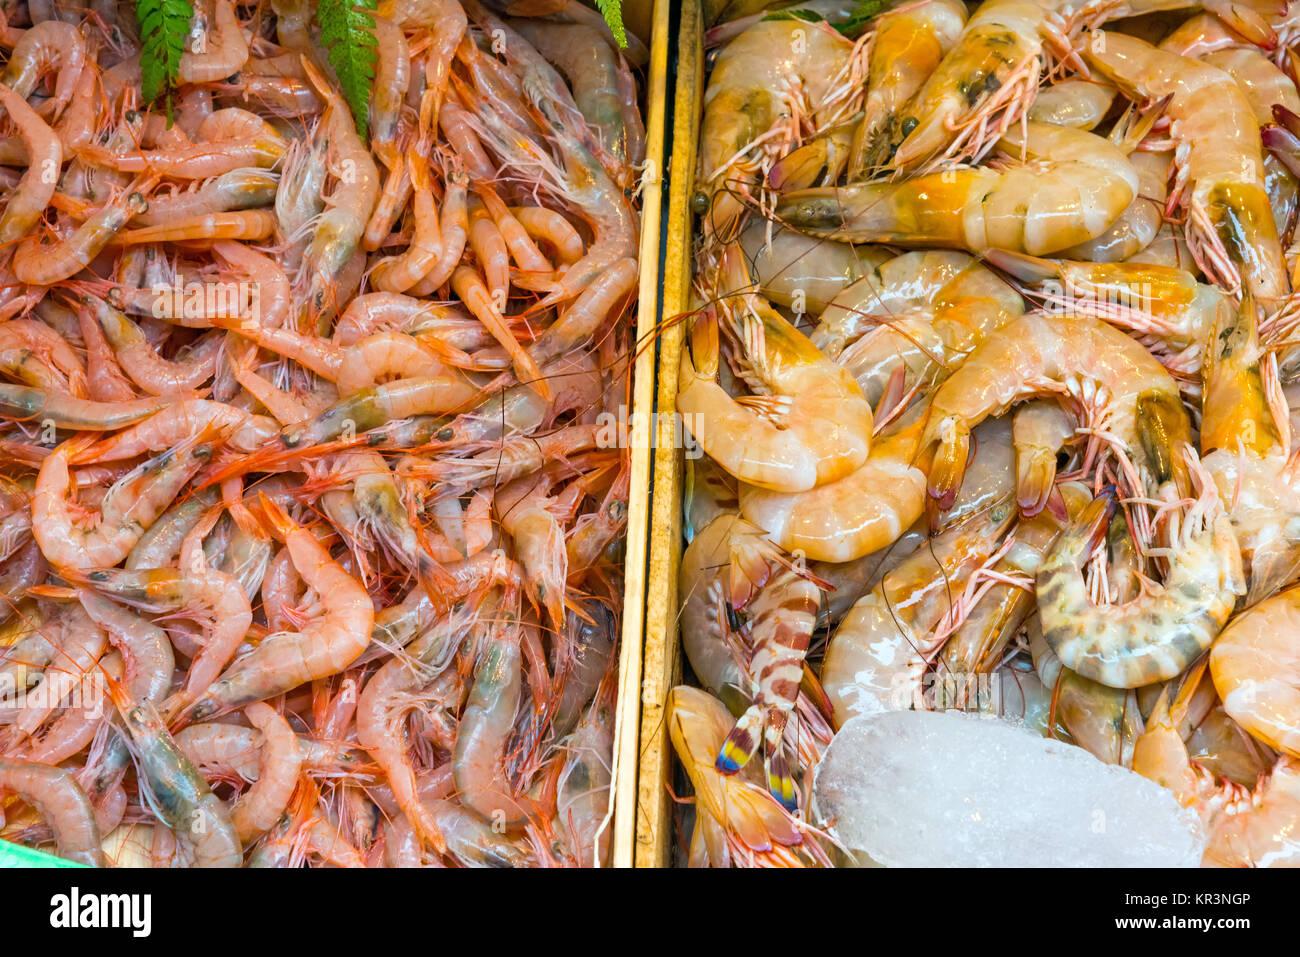 shrimp on the famous boqueria market in barcelona - Stock Image